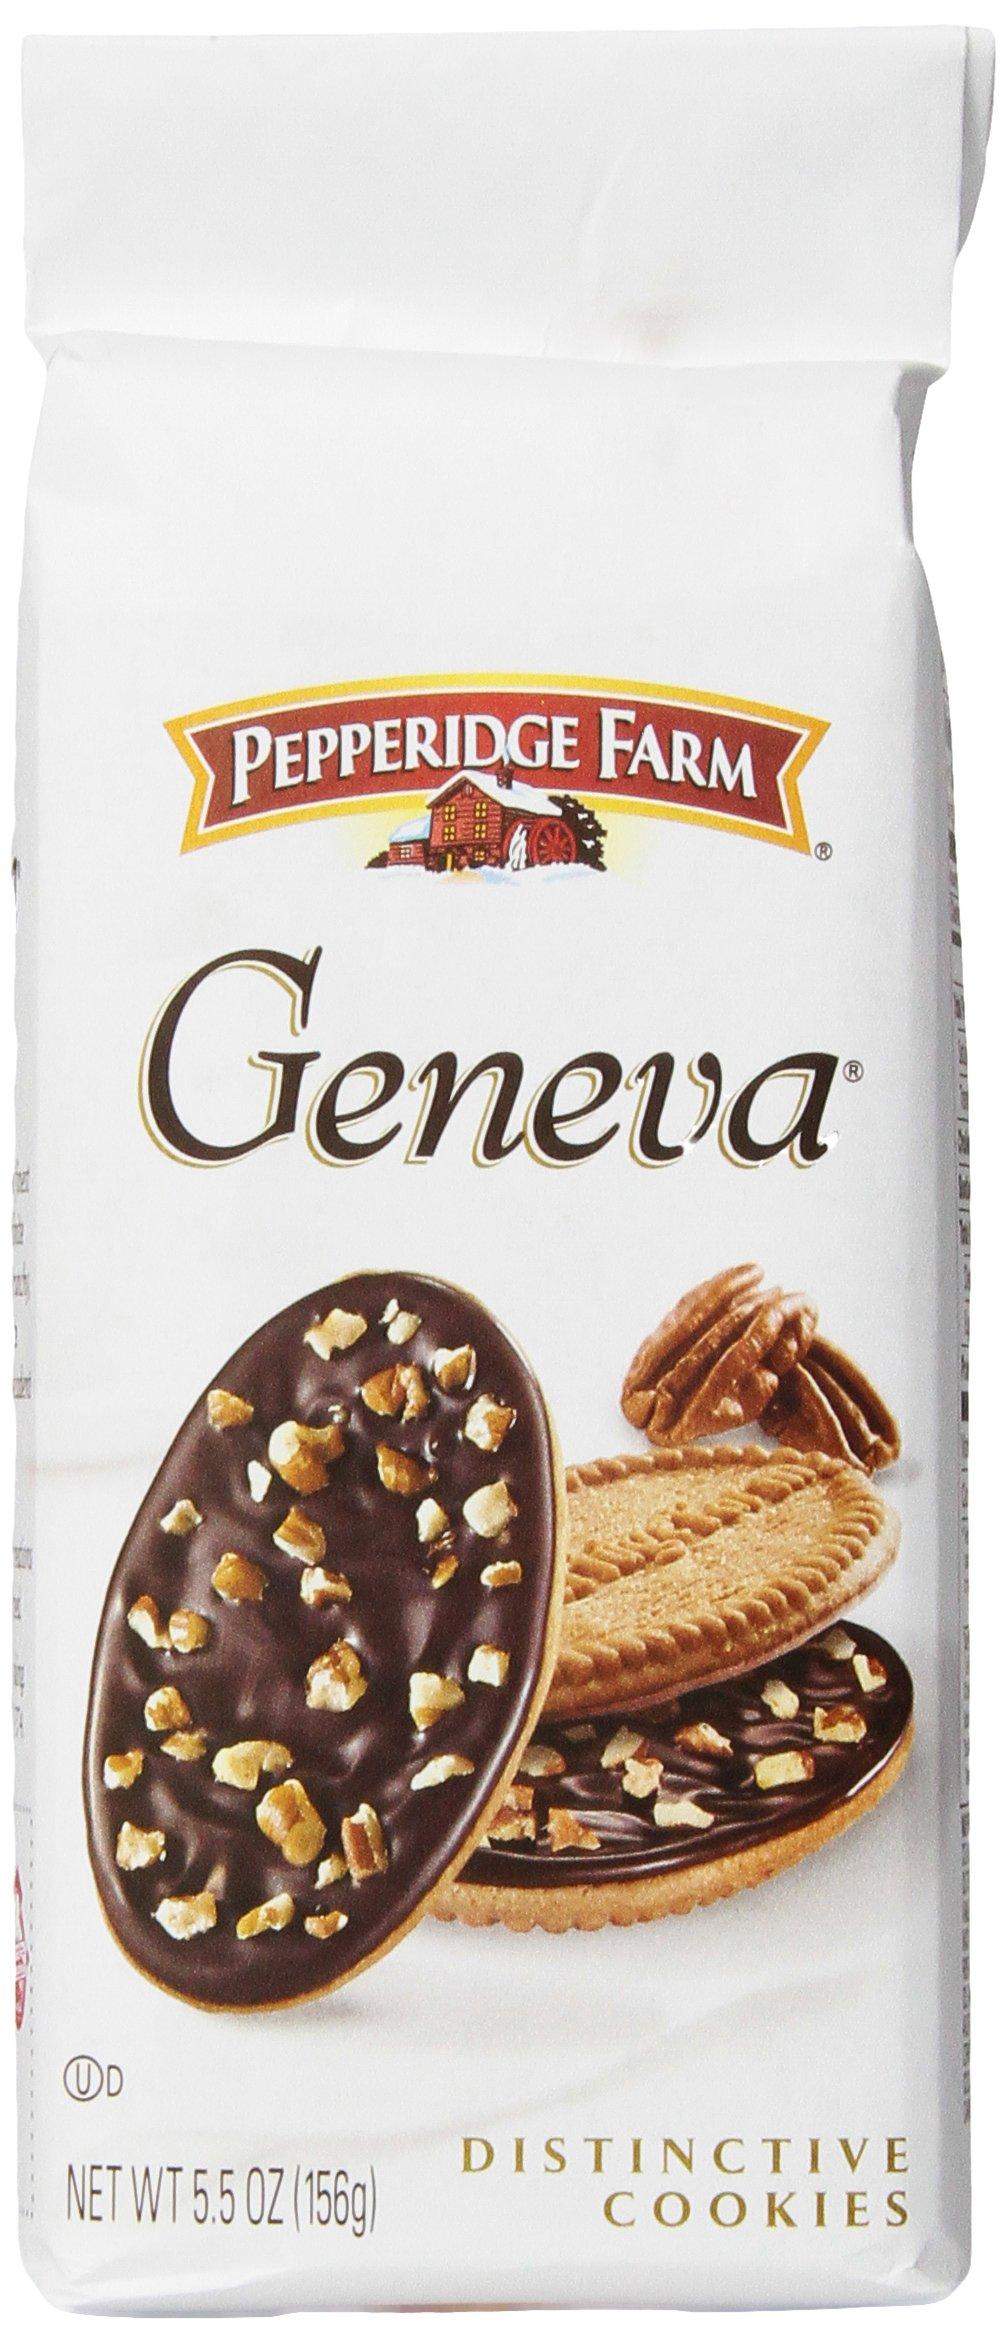 Pepperidge Farm Geneva Cookies, 5.5-ounce bag (pack of 4)